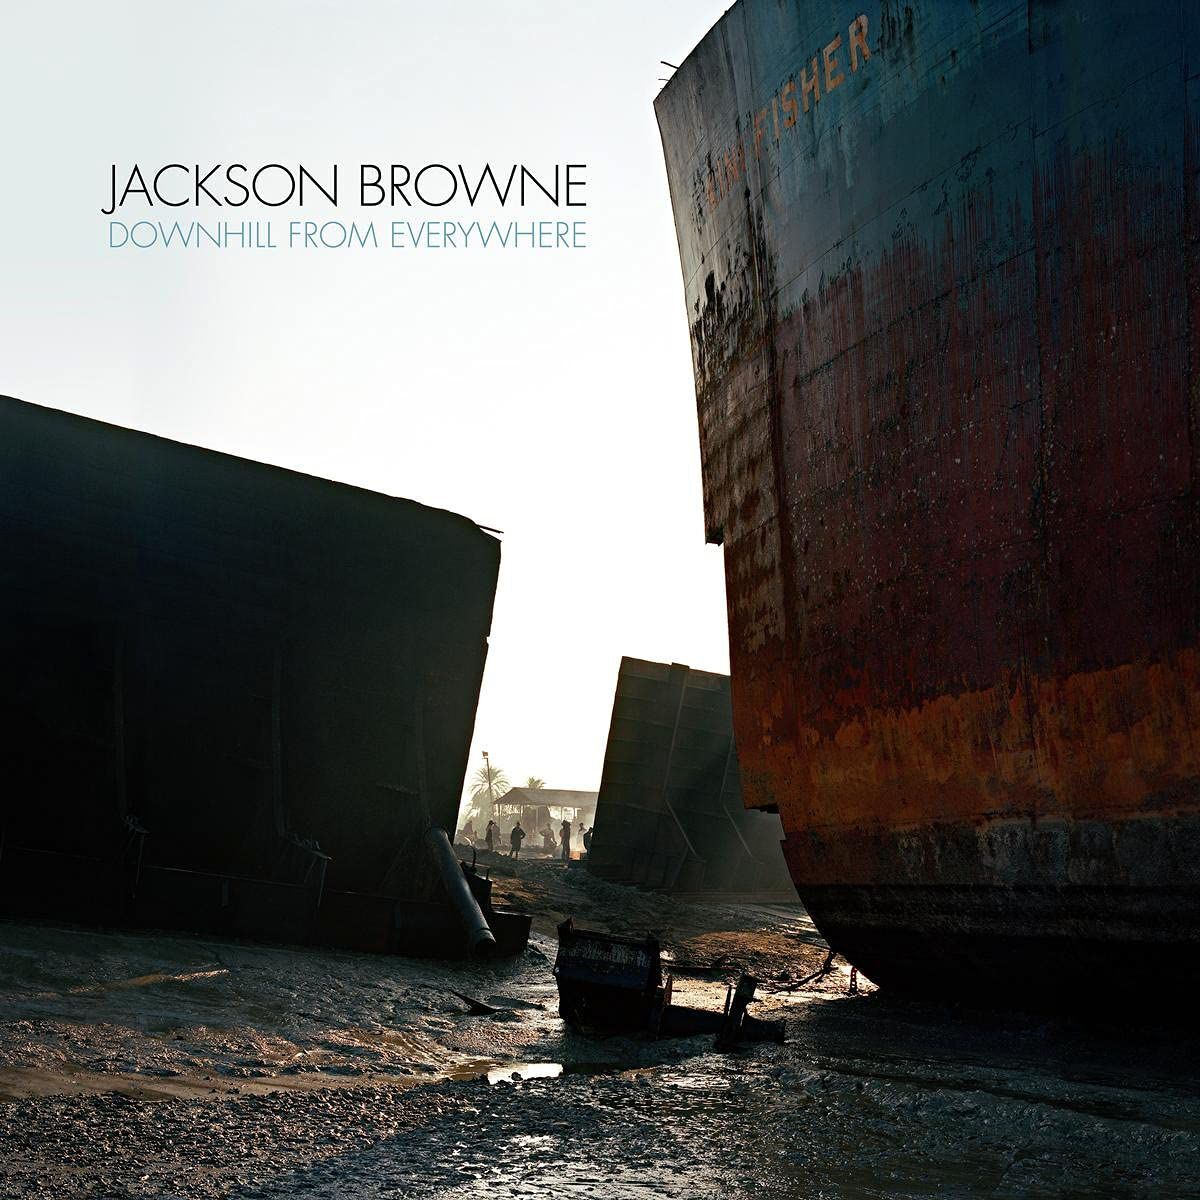 JacksonBrowneDownhillFromEverywhere.jpg